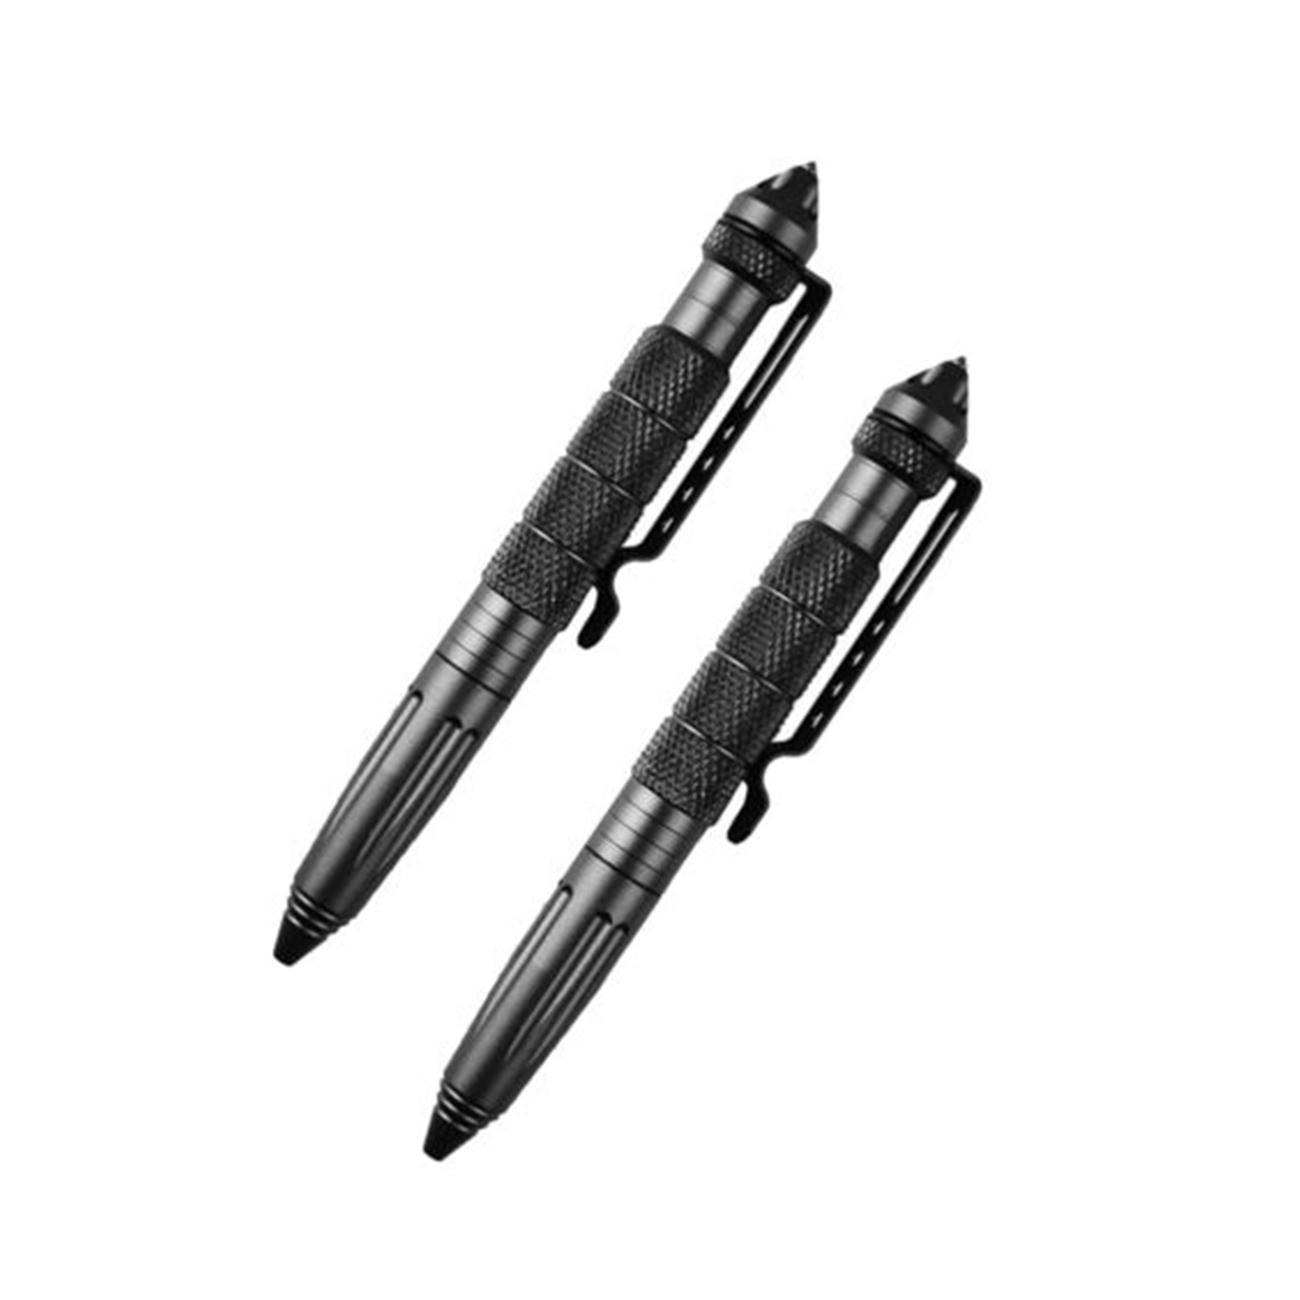 New 6/'/' Aluminum Tactical Pen Glass Breaker Self Defense Survival Military